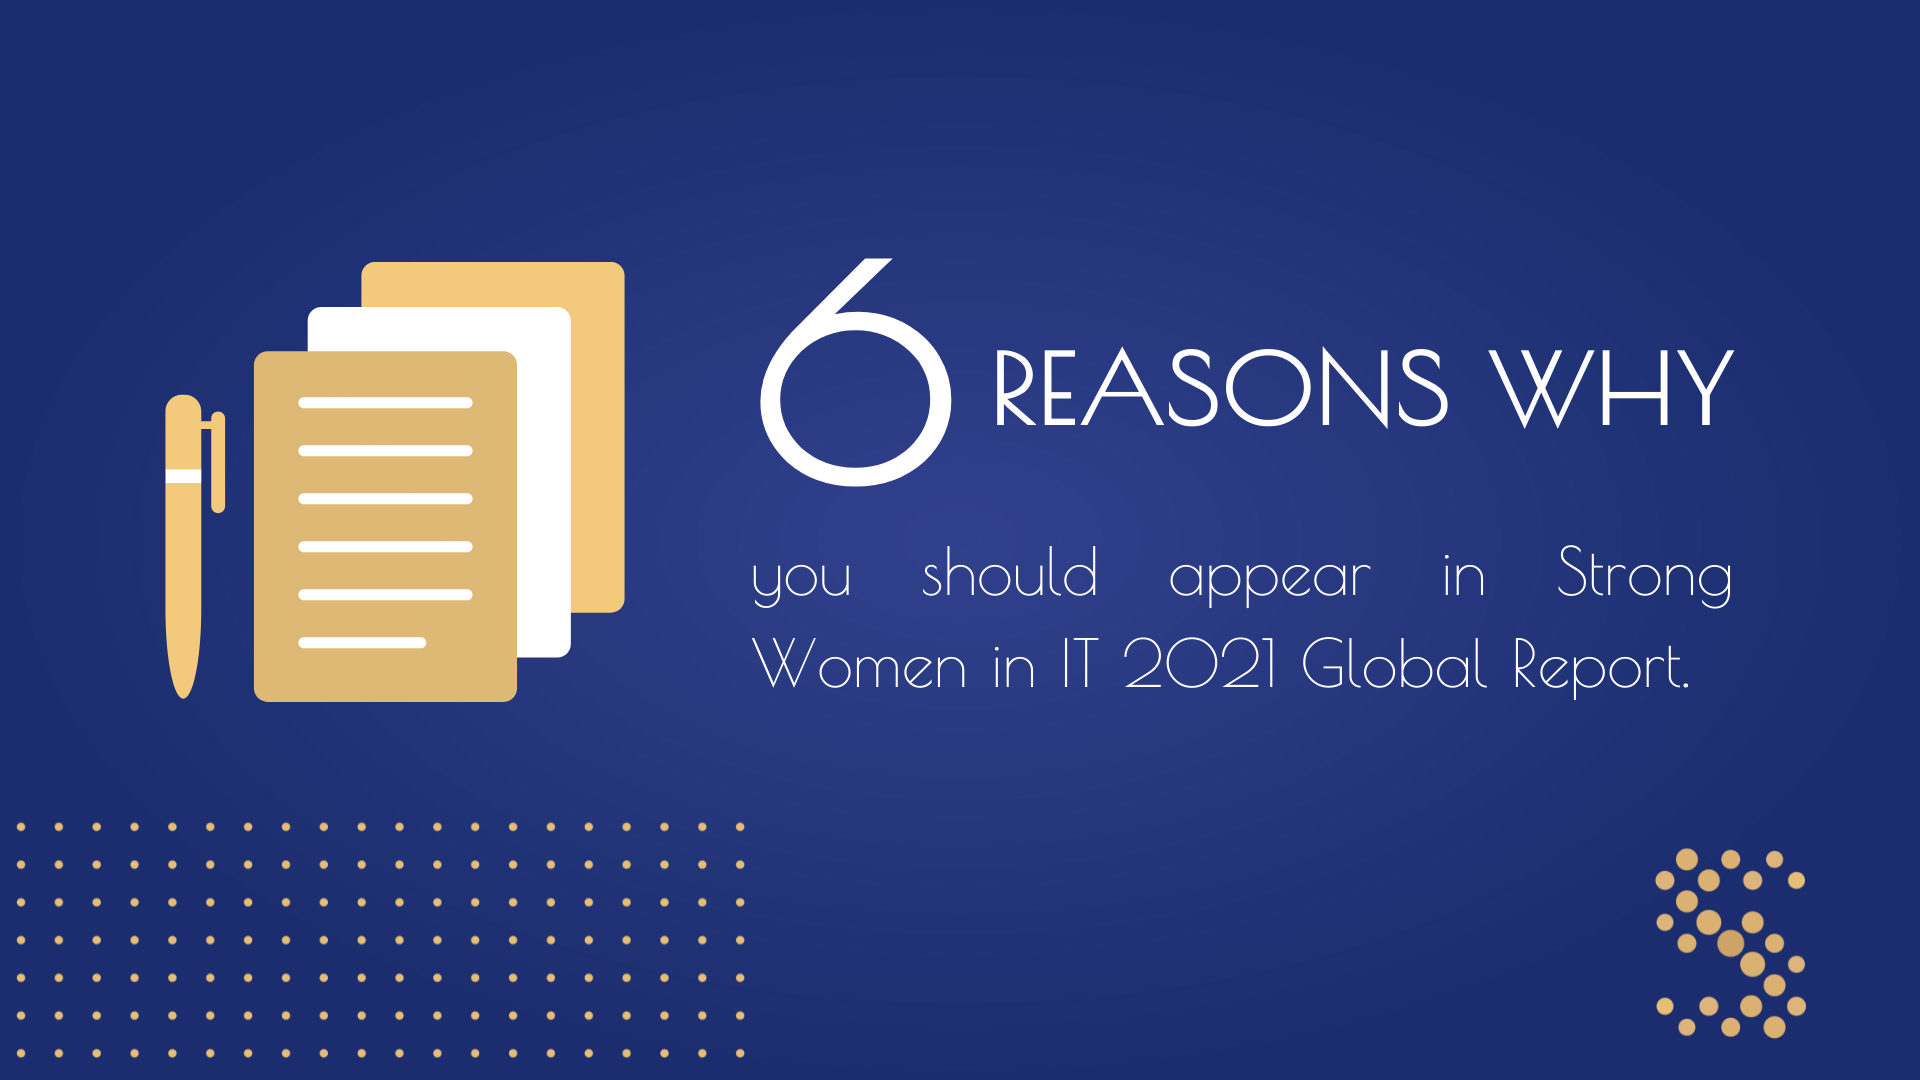 Strong Women in IT 2021 Global Report